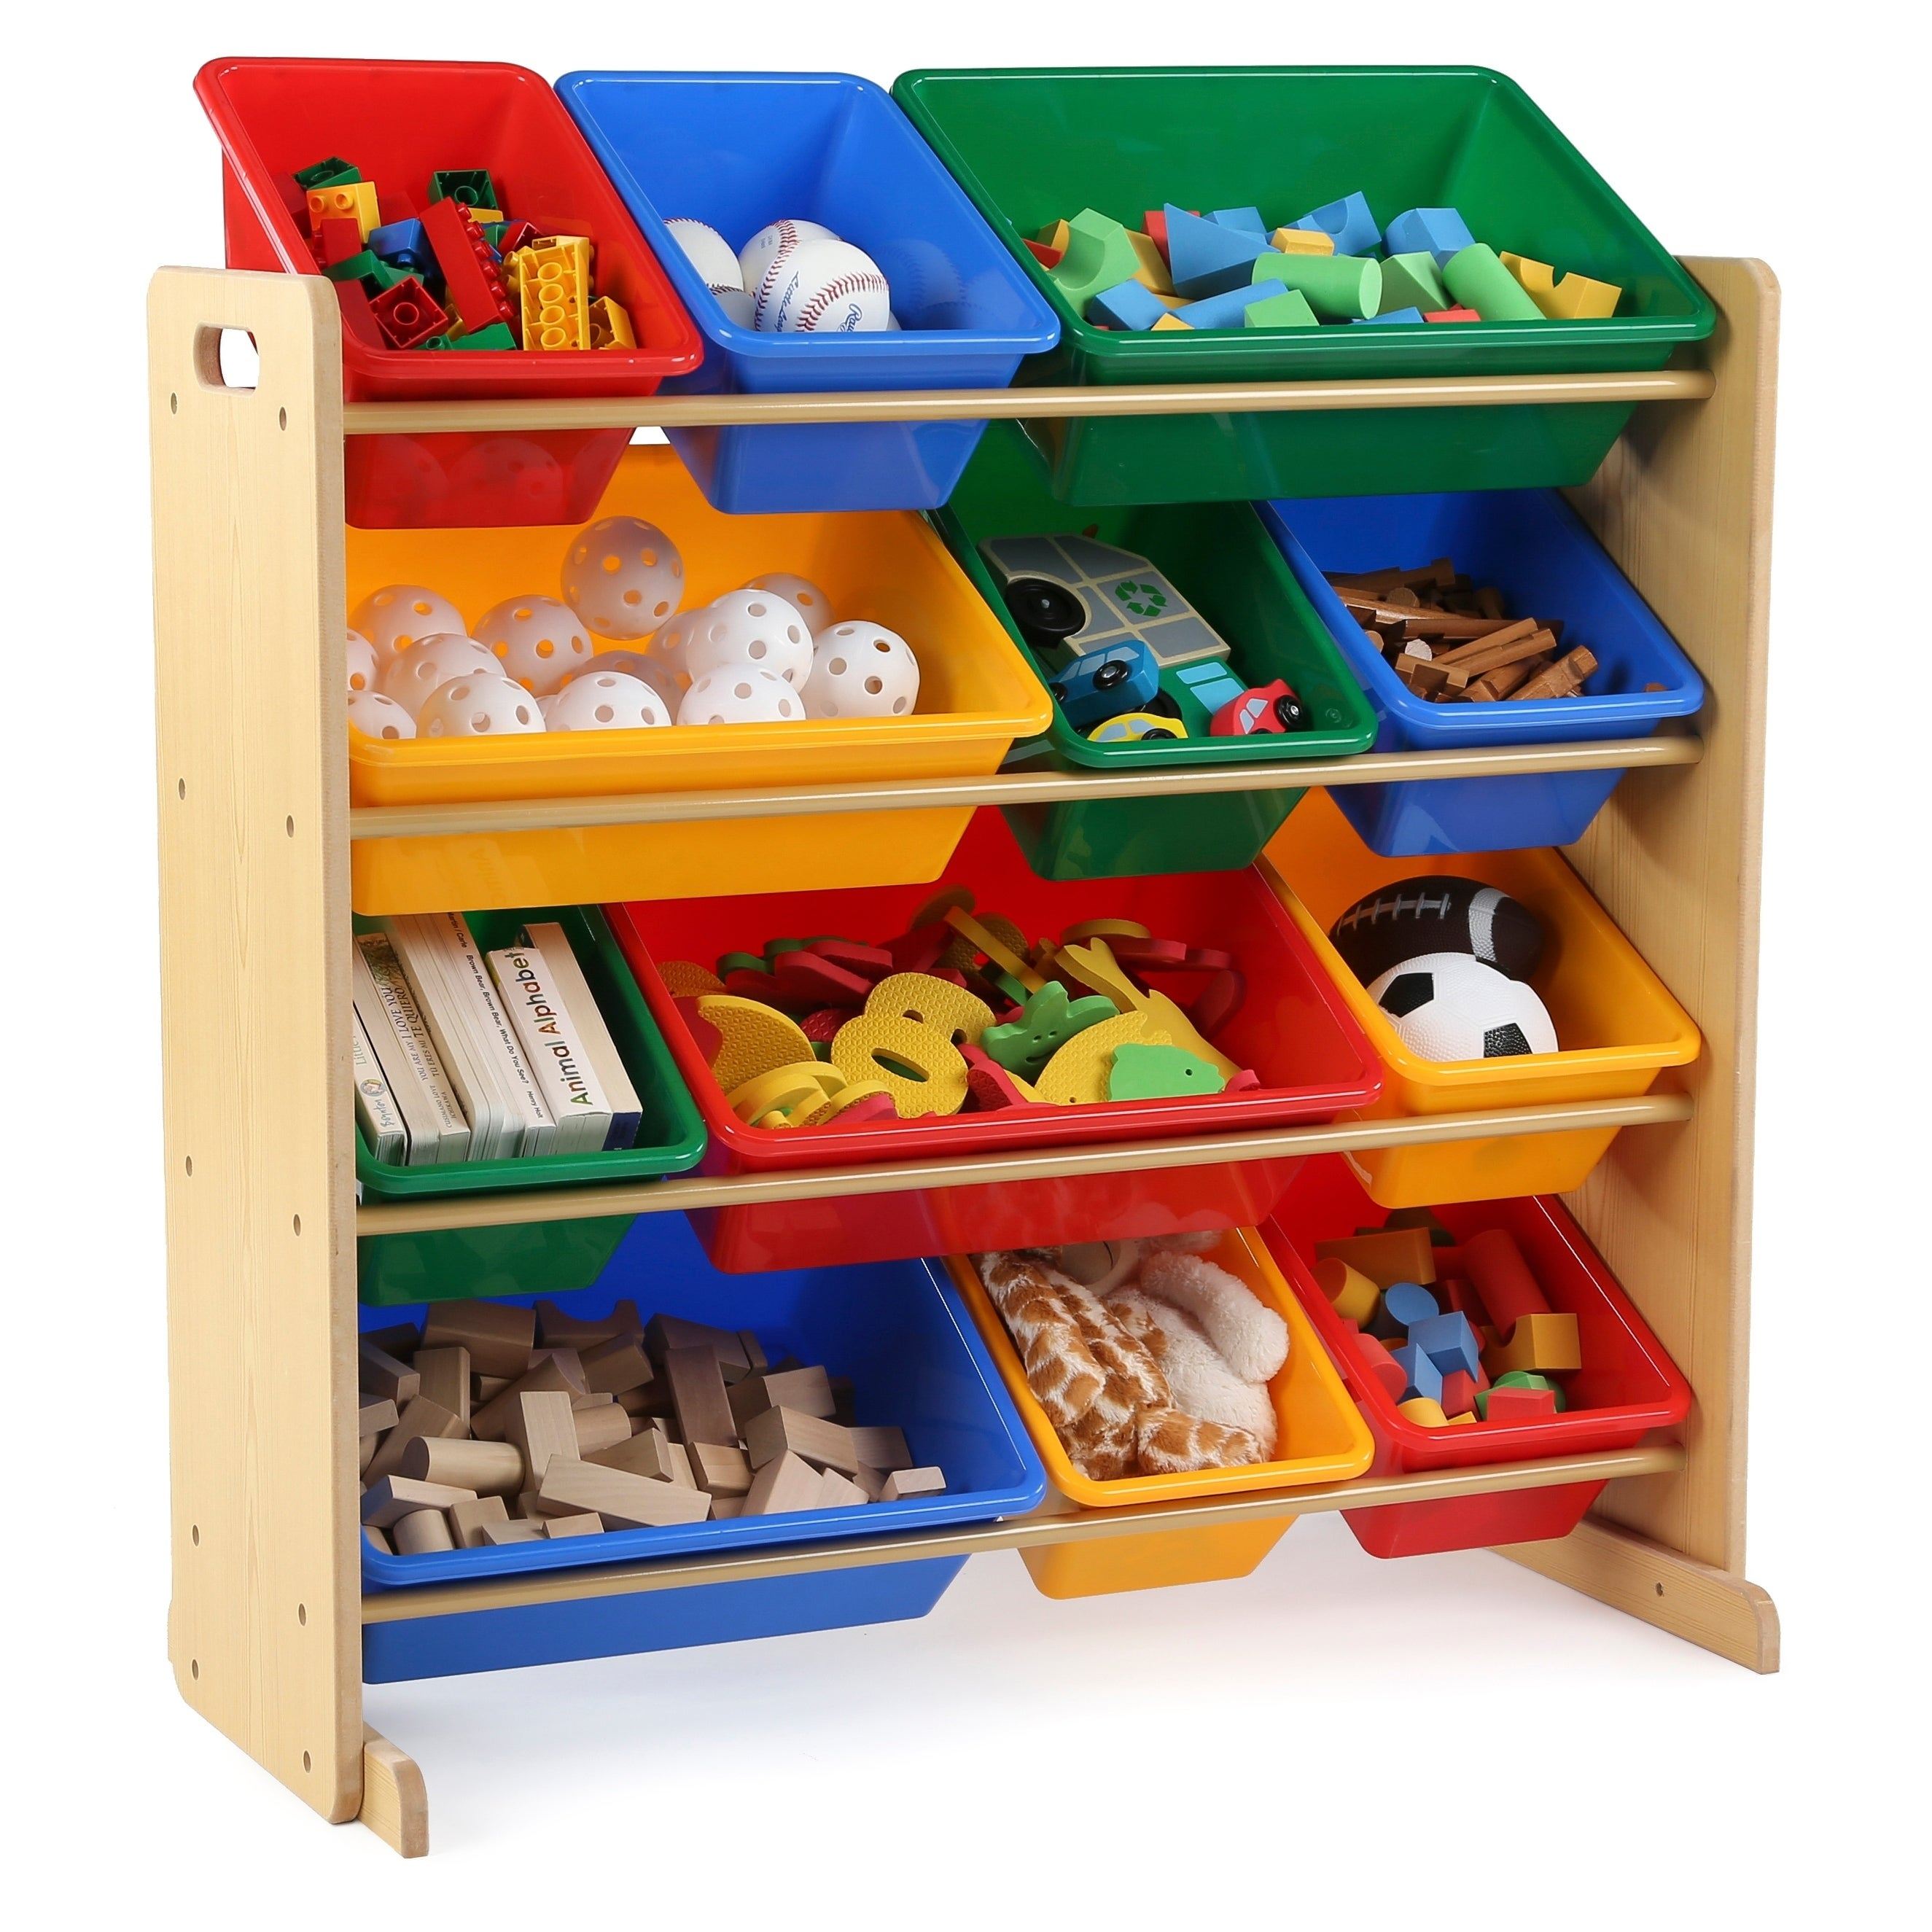 Tot Tutors Kids Wood Toy Storage Organizer With